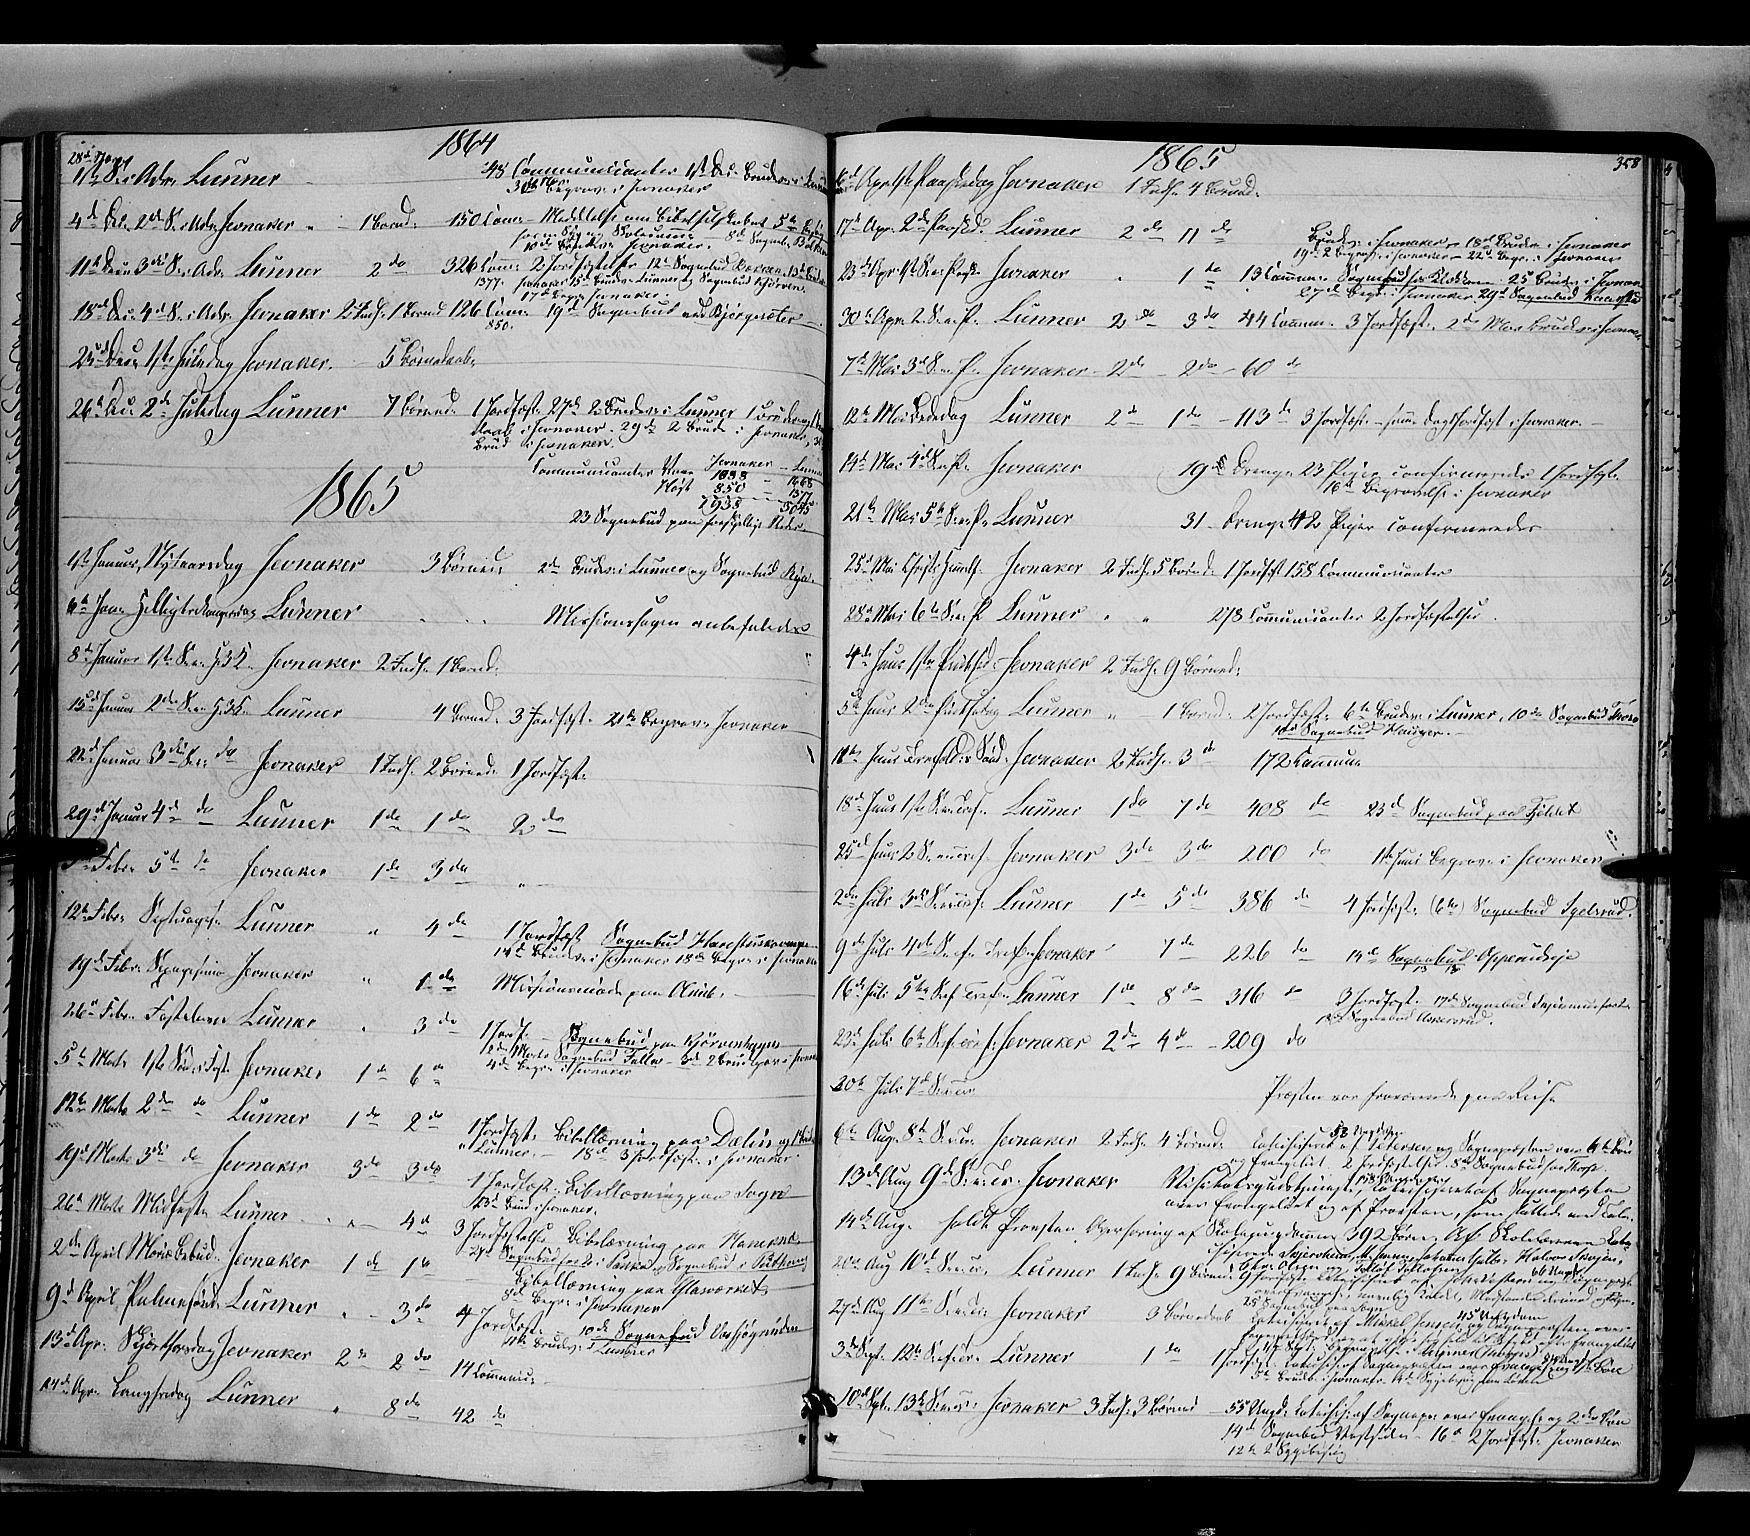 SAH, Jevnaker prestekontor, Ministerialbok nr. 7, 1858-1876, s. 358